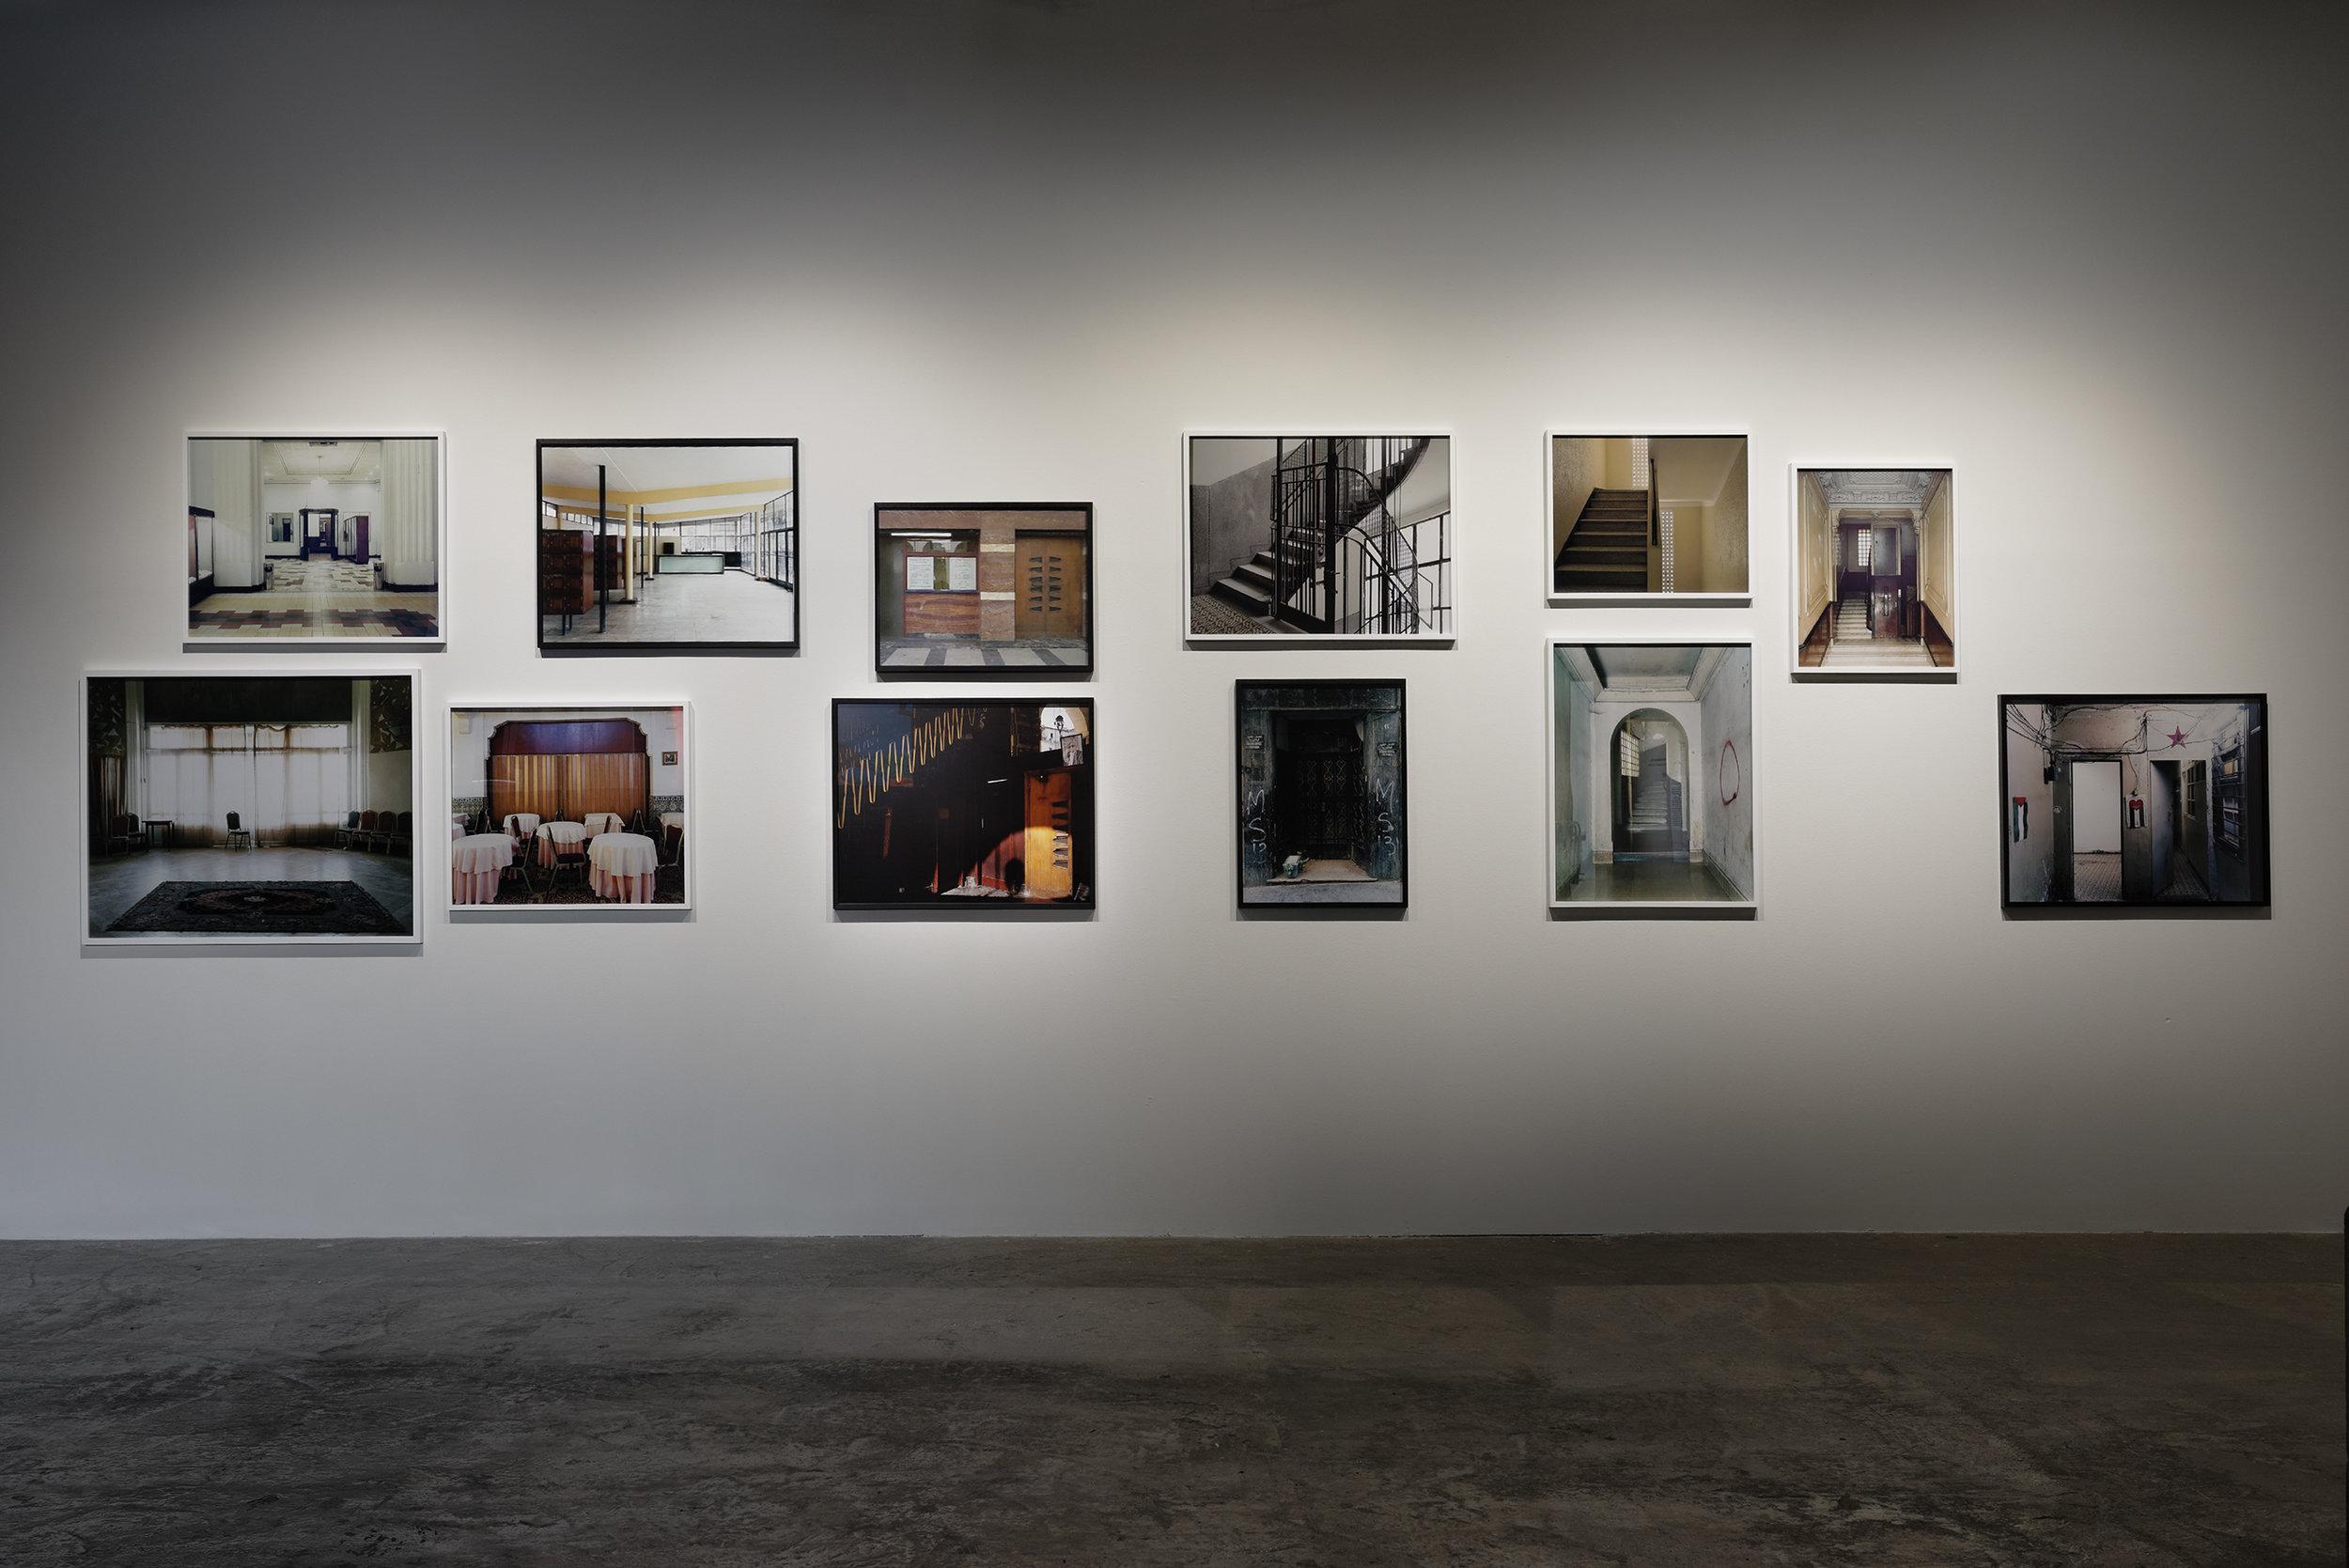 Bouchra Khalili's exhibition. Palais de Tokyo.